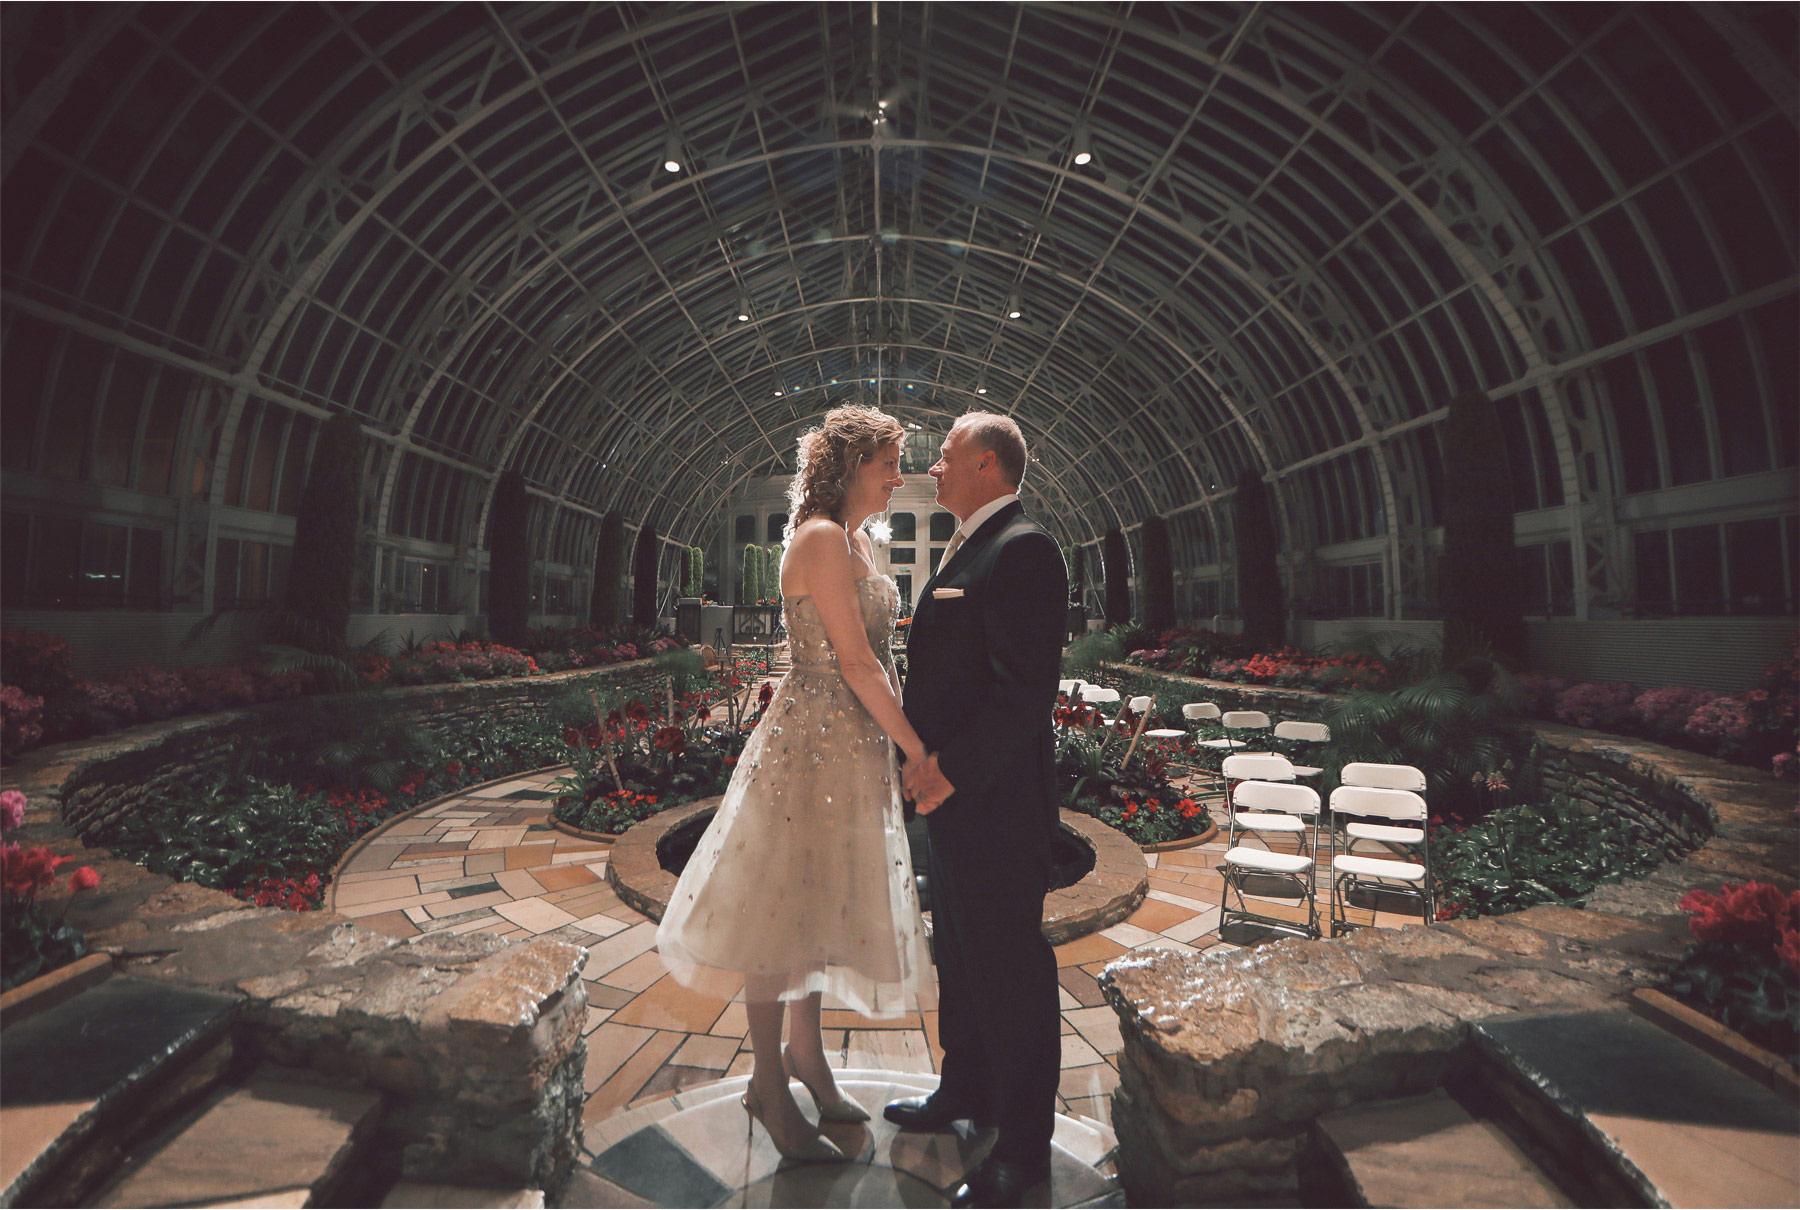 20-Saint-Paul-Minnesota-Wedding-Photographer-by-Andrew-Vick-Photography-Winter-Como-Park-Conservatory-Sunken-Garden-Bride-Groom-Flowers-Night-Vintage-Dannette-and-Darren.jpg